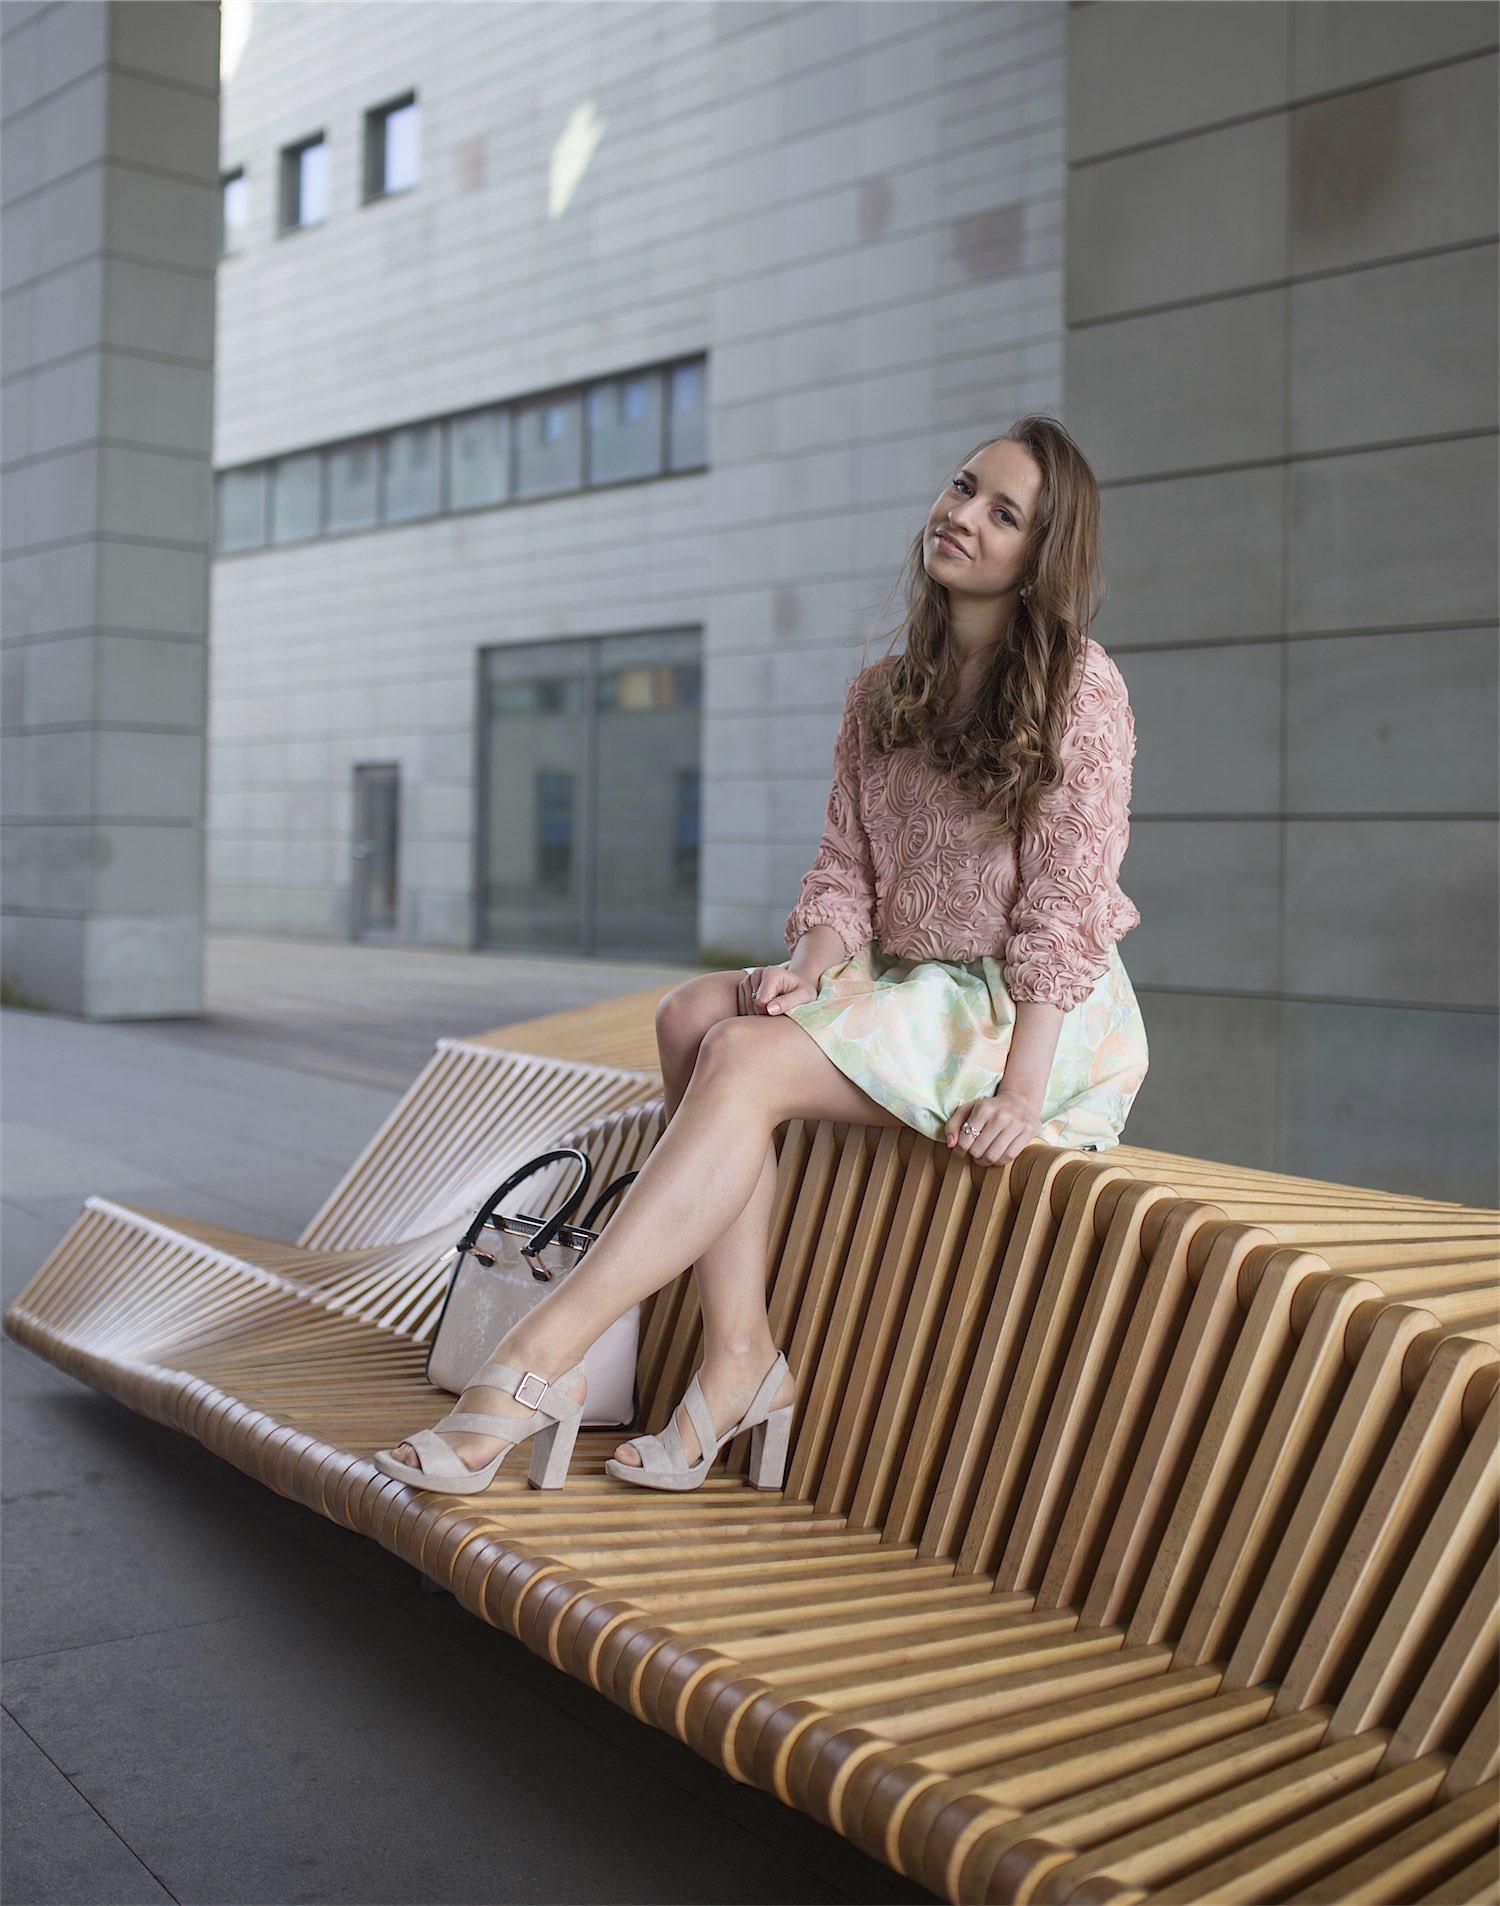 fashion-blogger-kateillustrate-tedbaker-skirt1